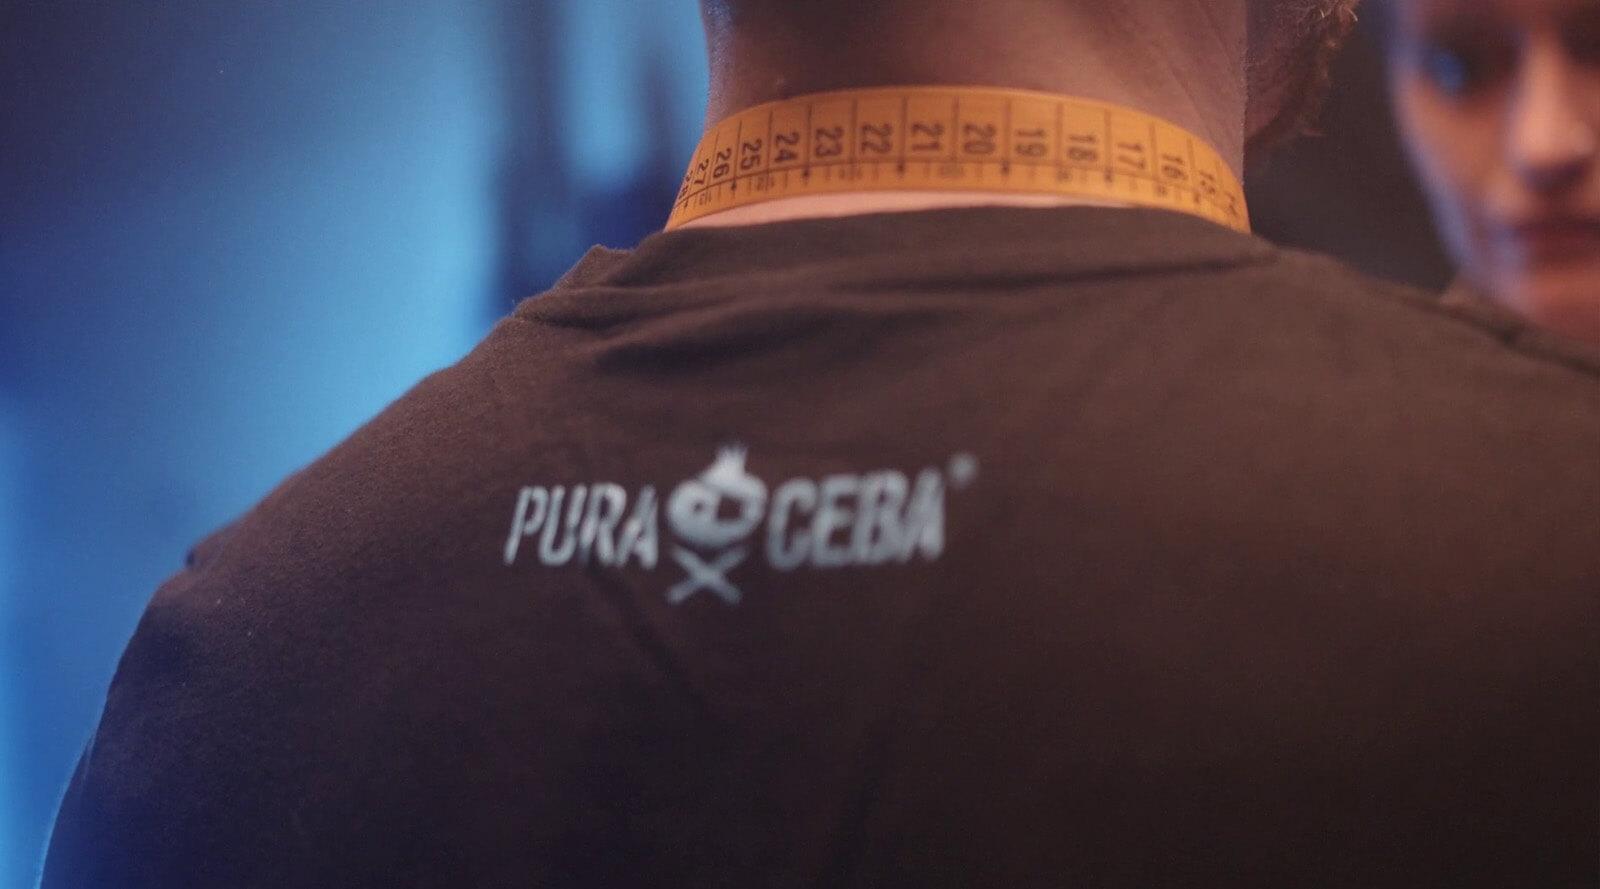 pura-ceba-x-hugo-dax-projecte00